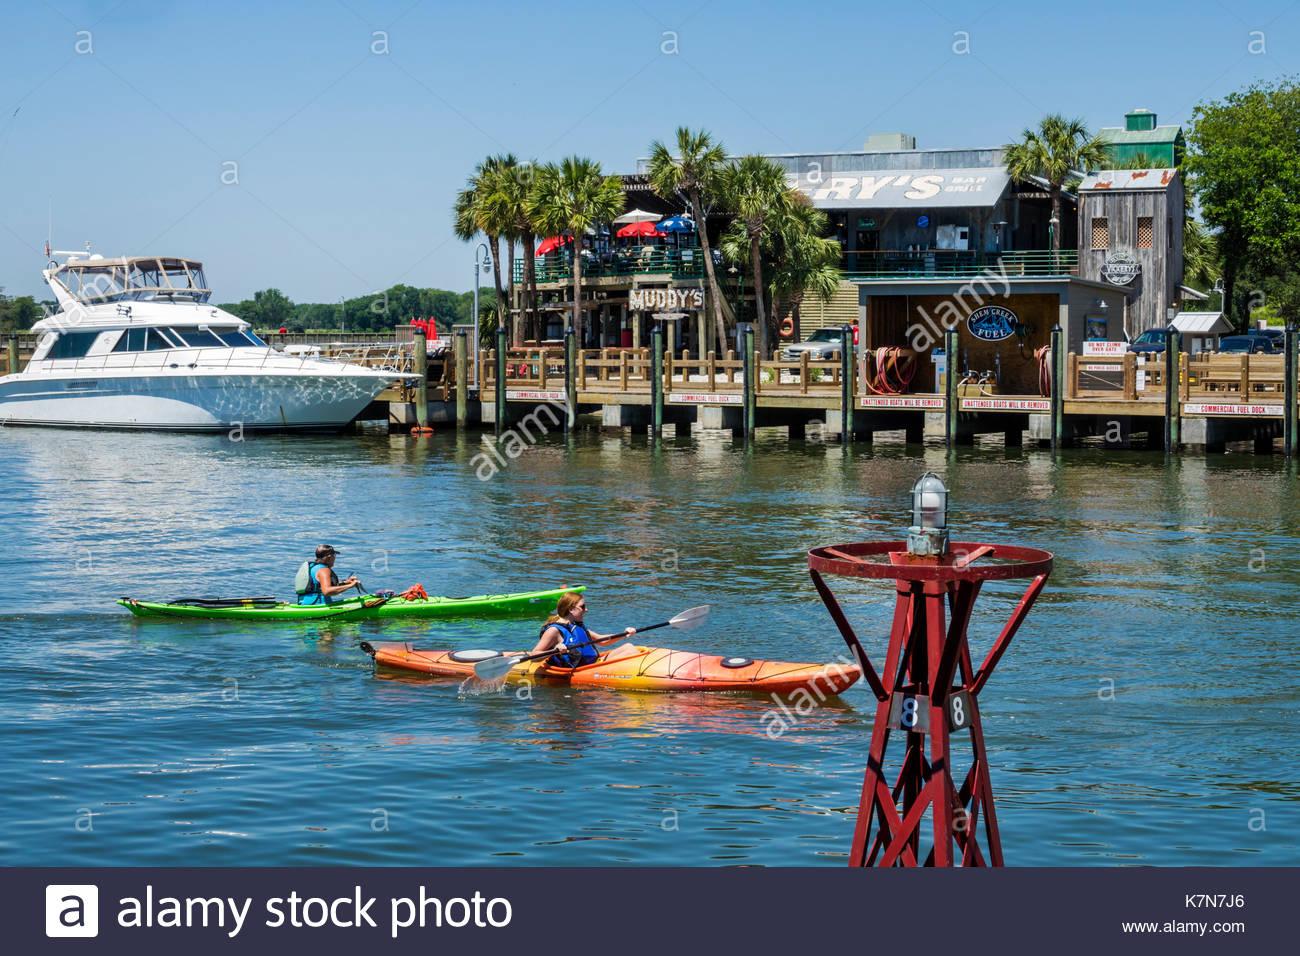 Caroline du Sud SC Mt. Agréable Shem Creek waterfront watersport kayak femme Muddy's restaurant Photo Stock